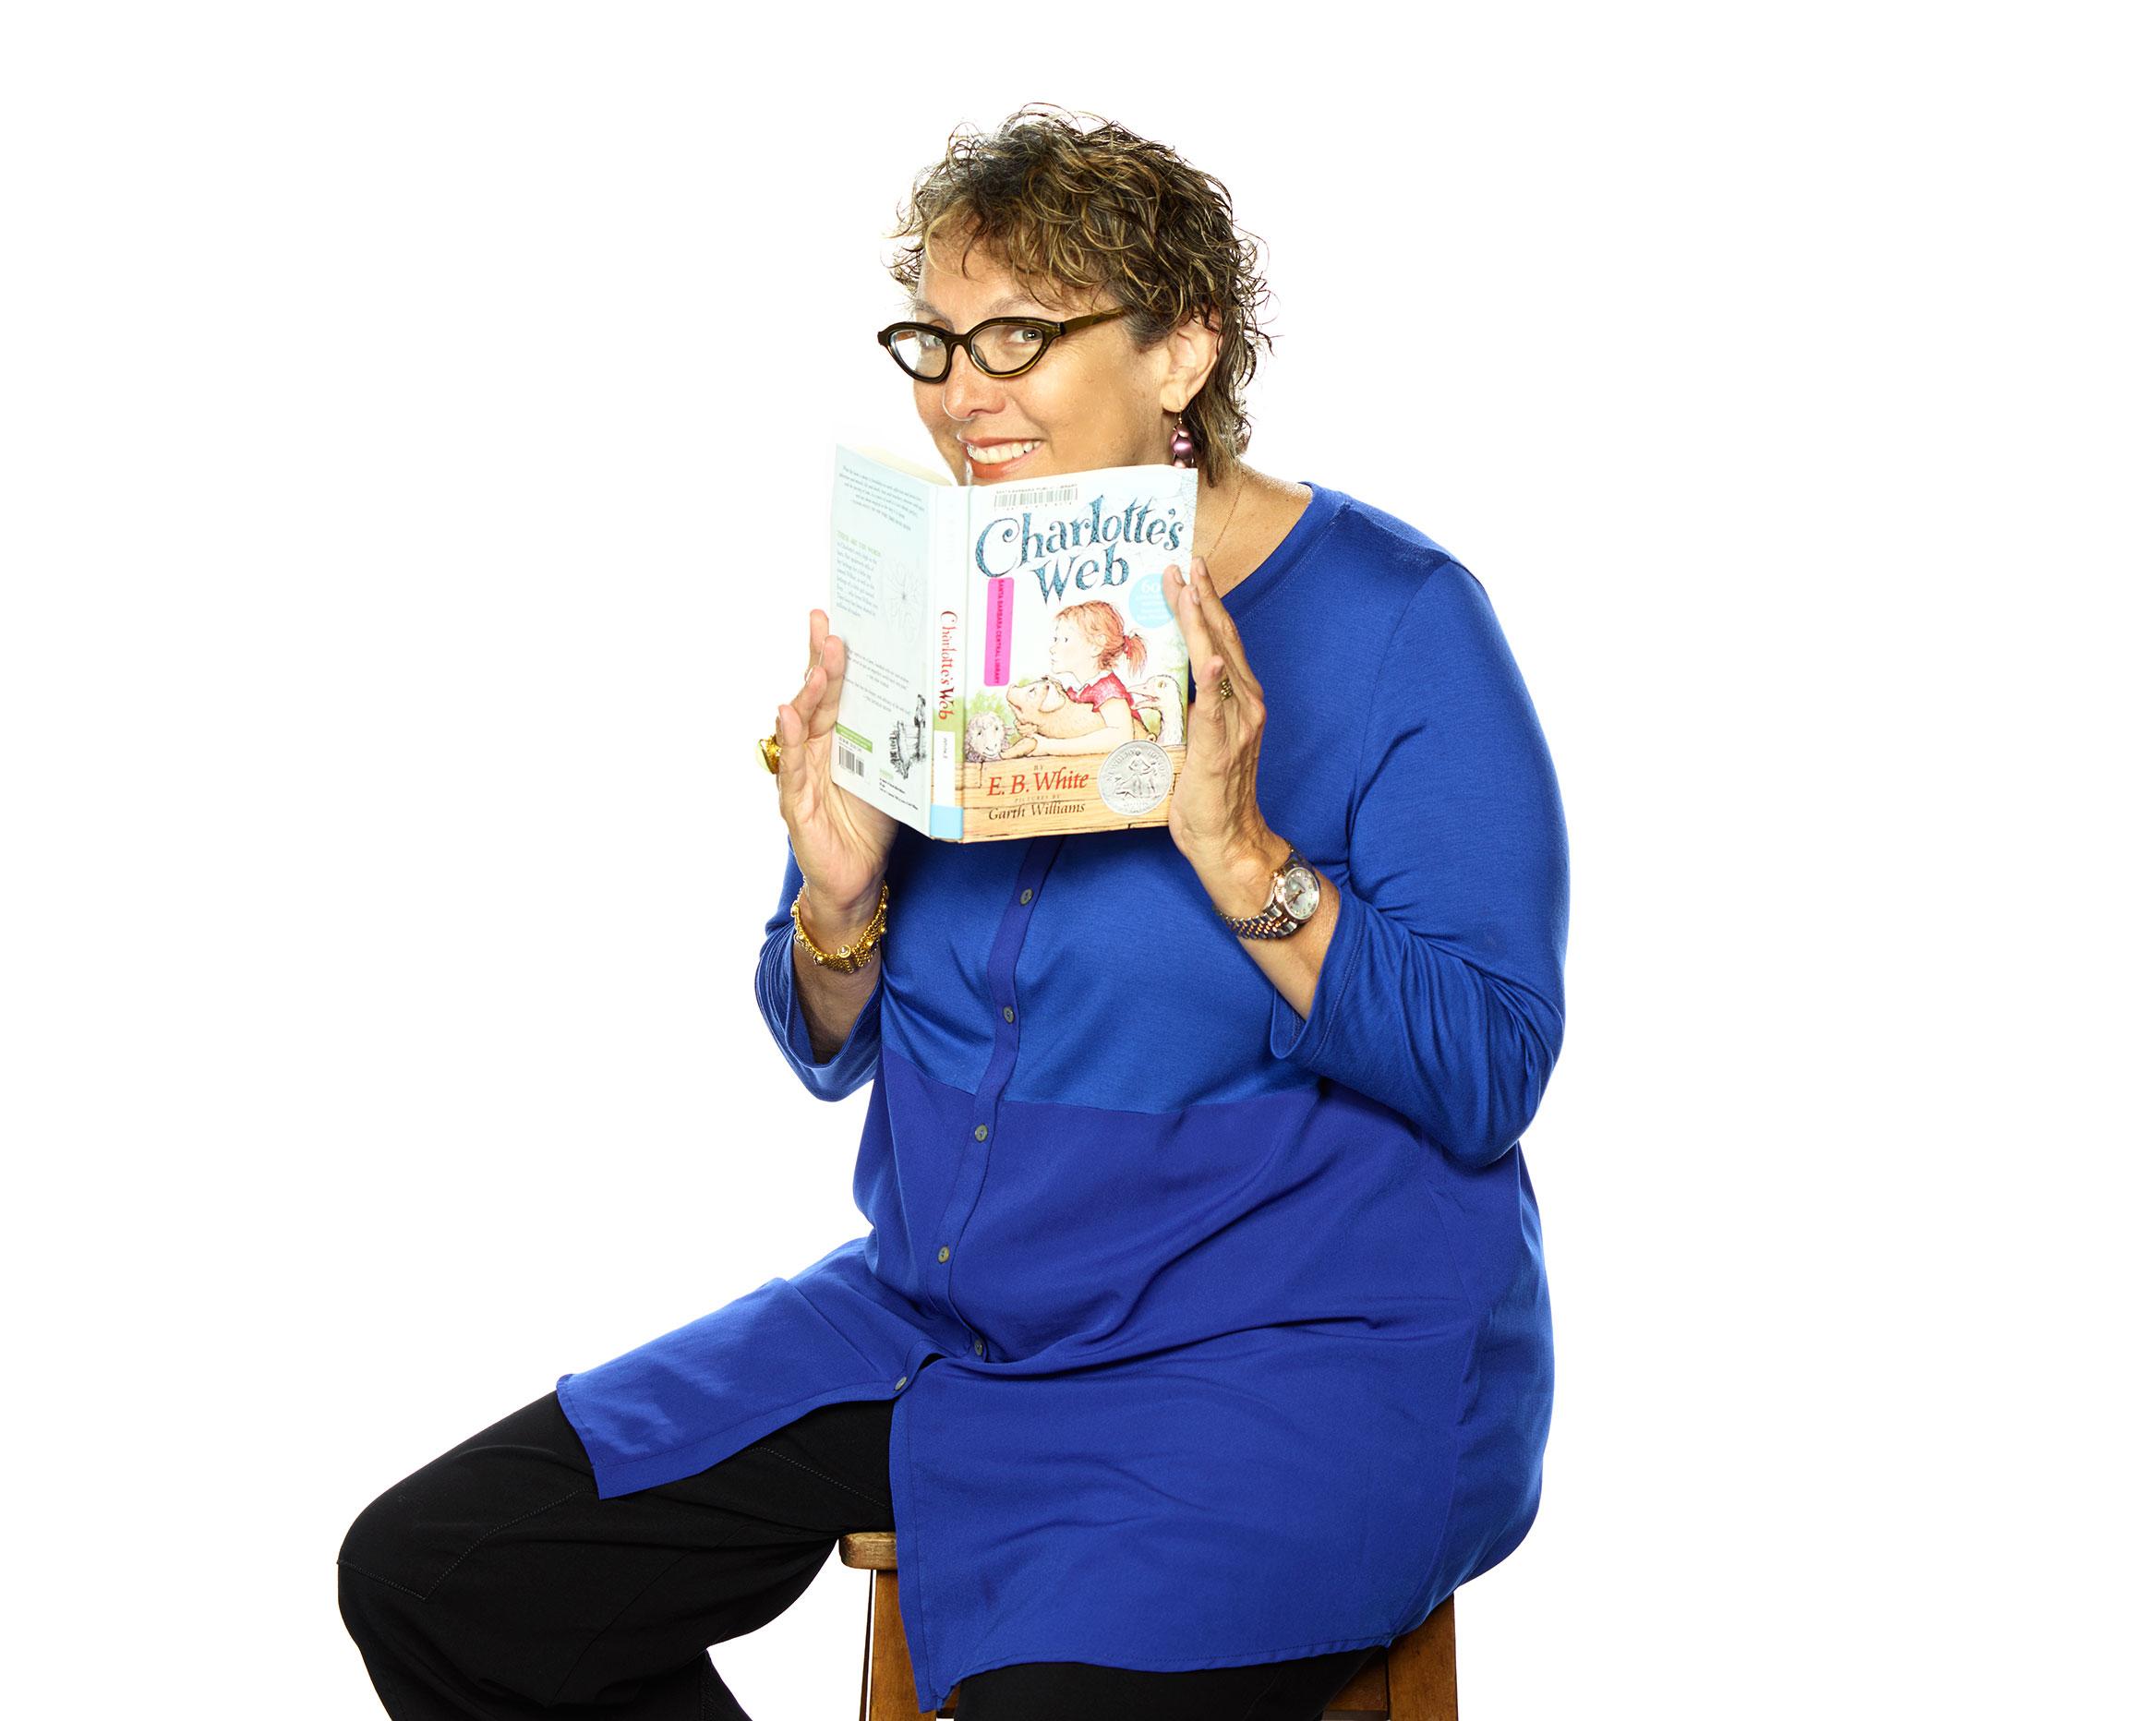 Lynda Weinman: Literacy Advocate